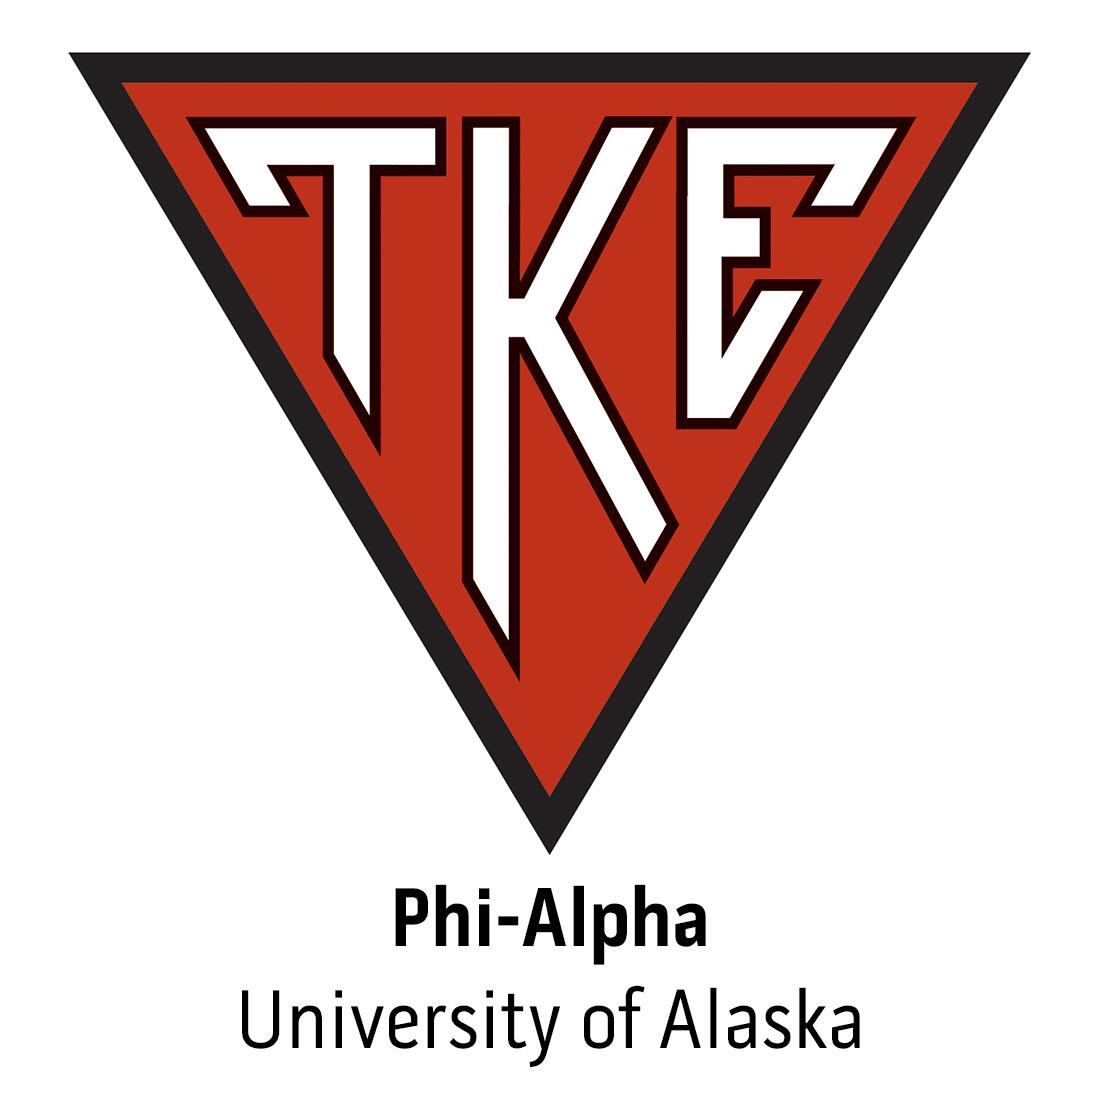 Phi-Alpha Chapter at University of Alaska